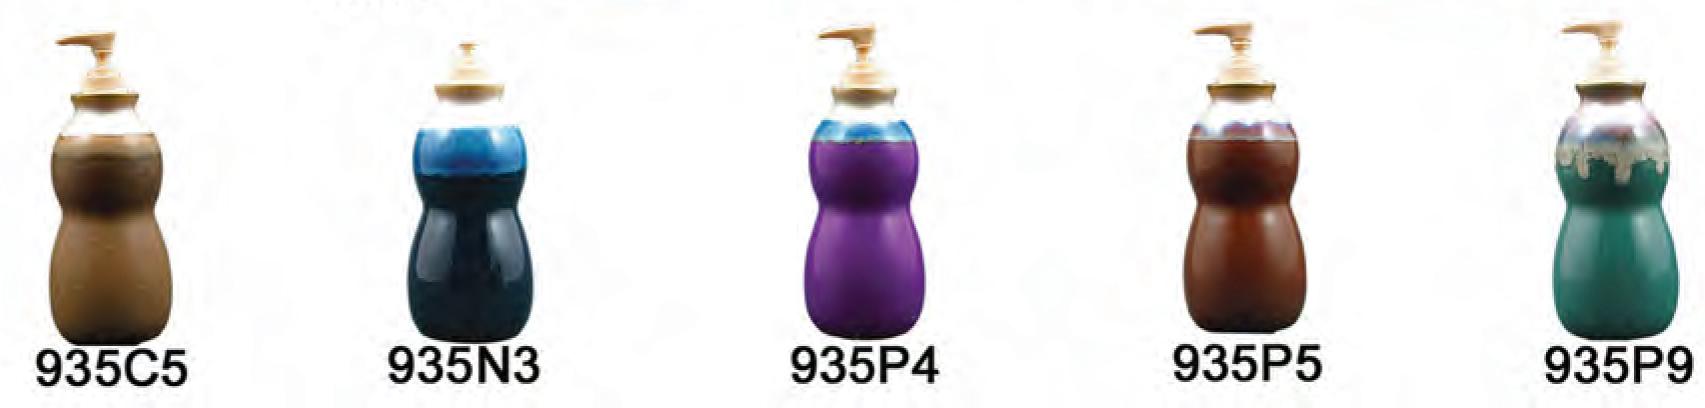 stoneware-soap-dispenser-colors.jpg